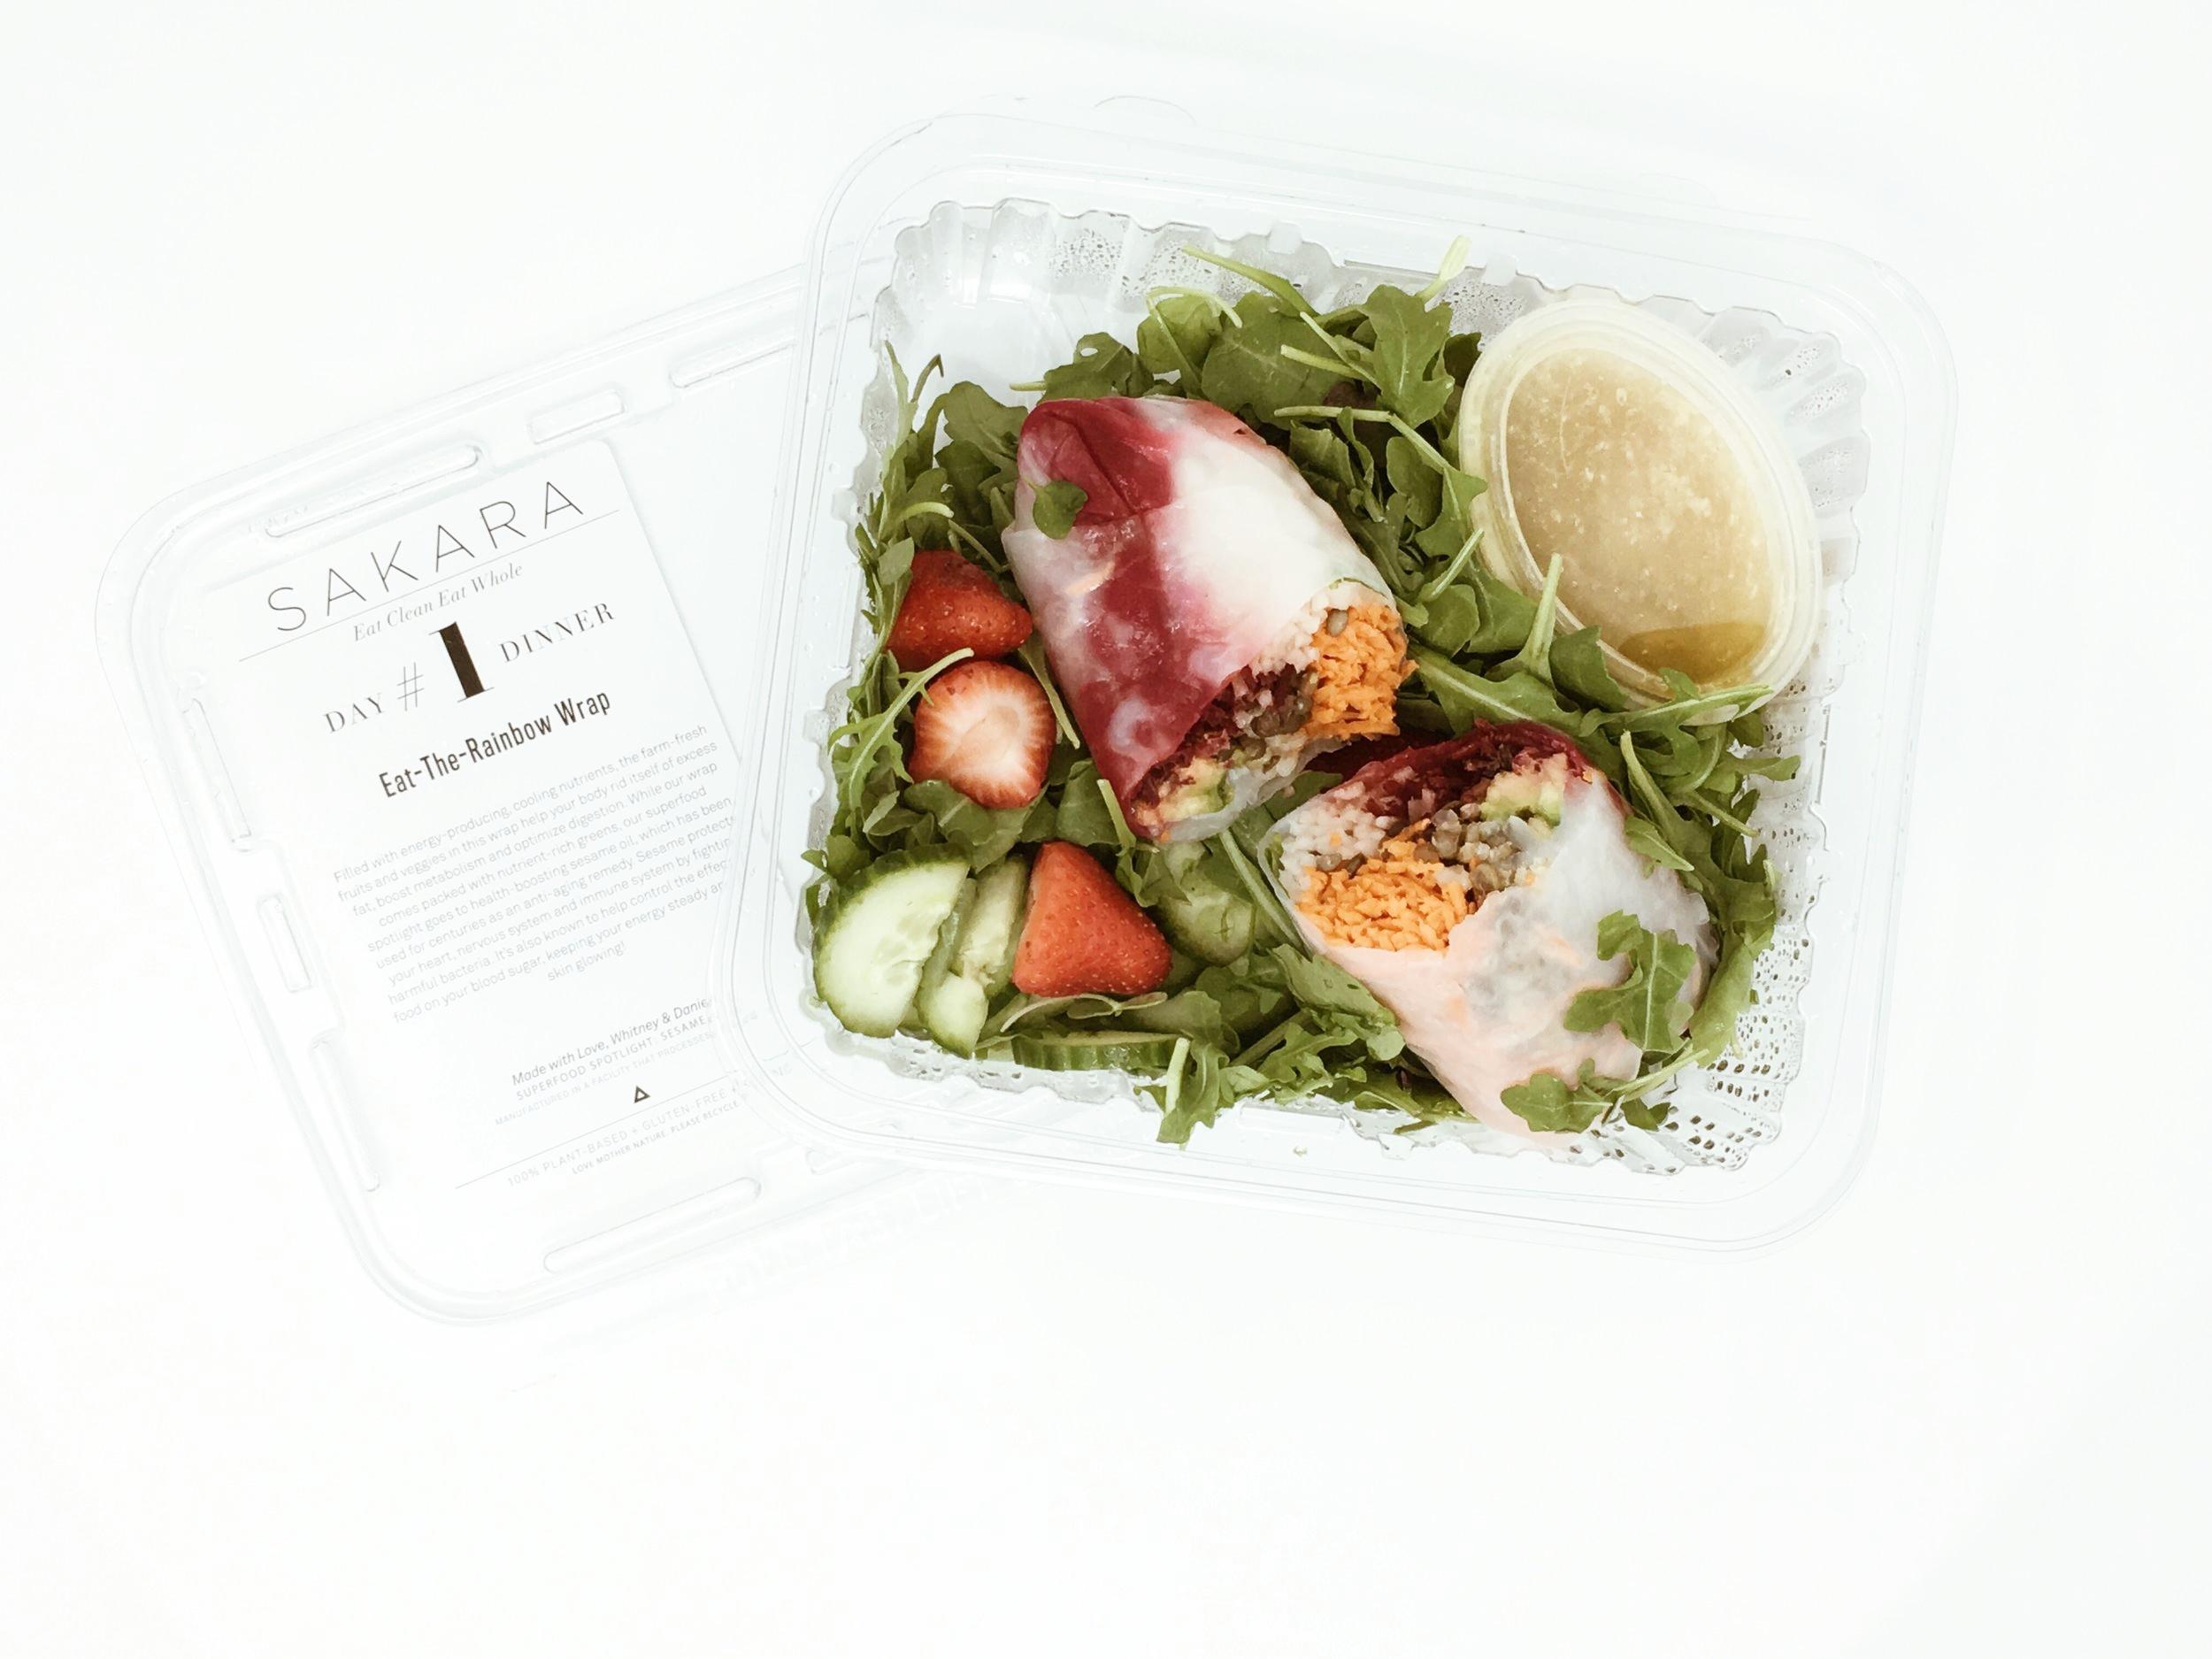 eat the rainbow wrap sakara menu